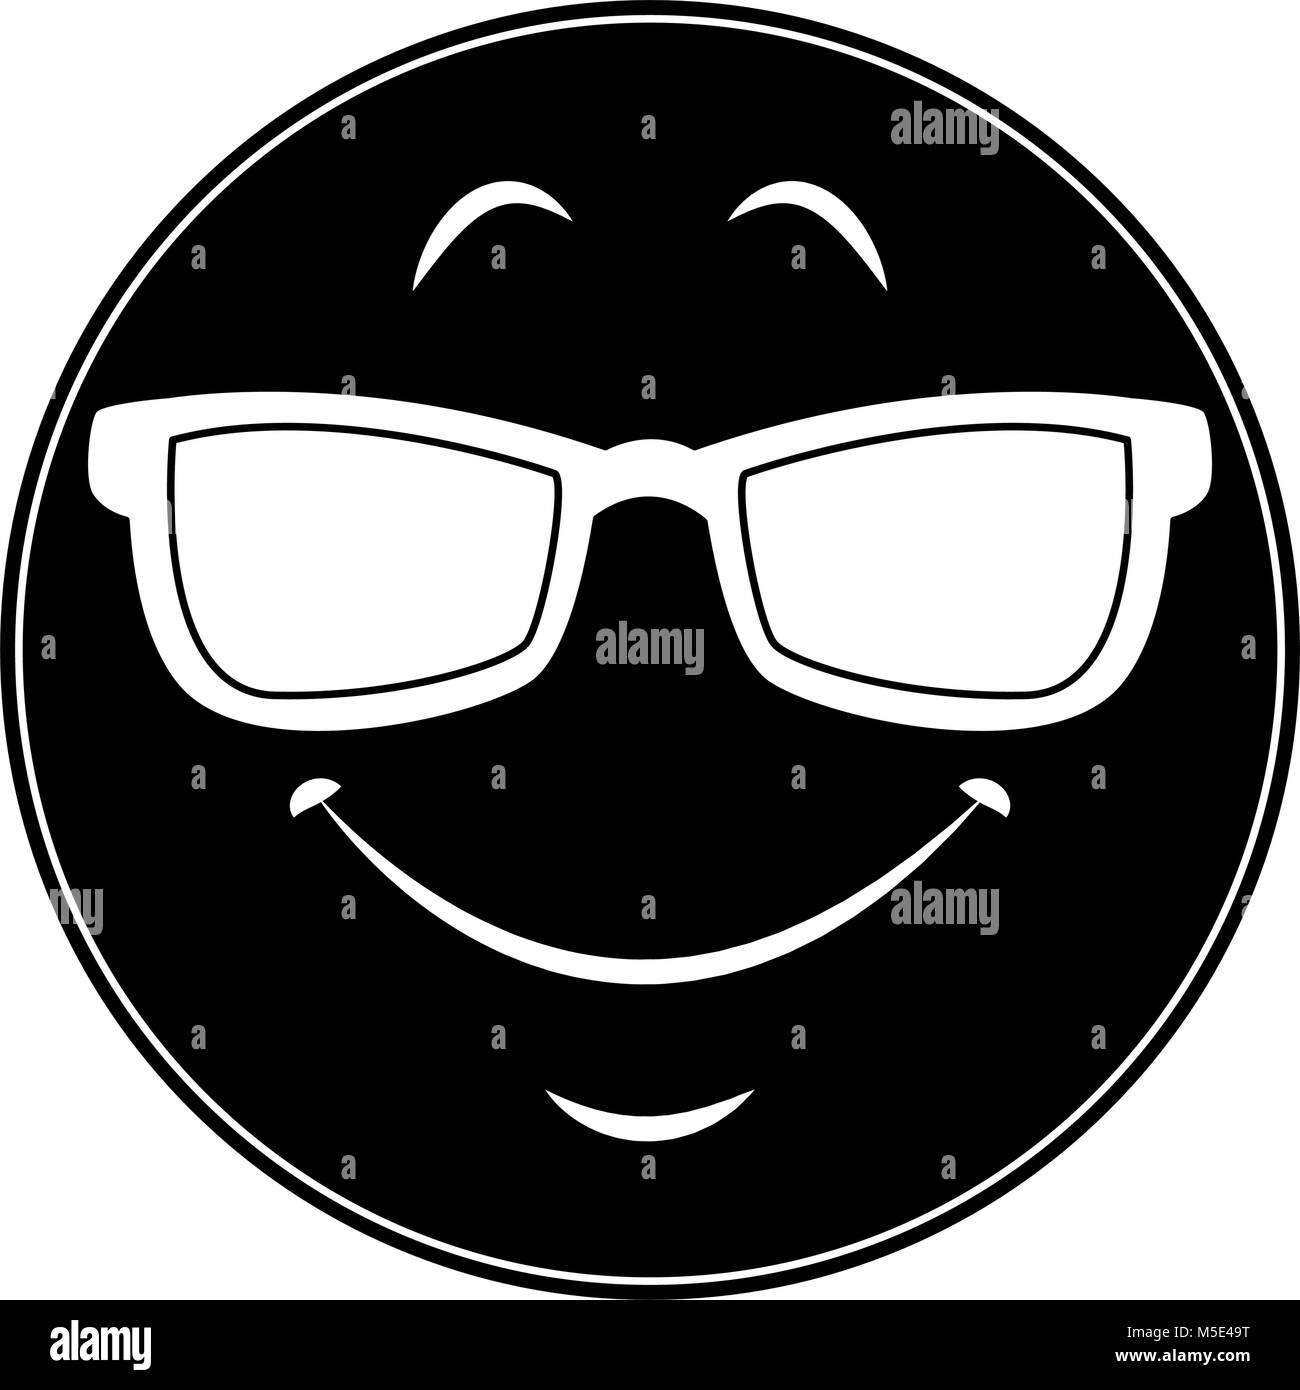 Emoji with sunglasses - Stock Image